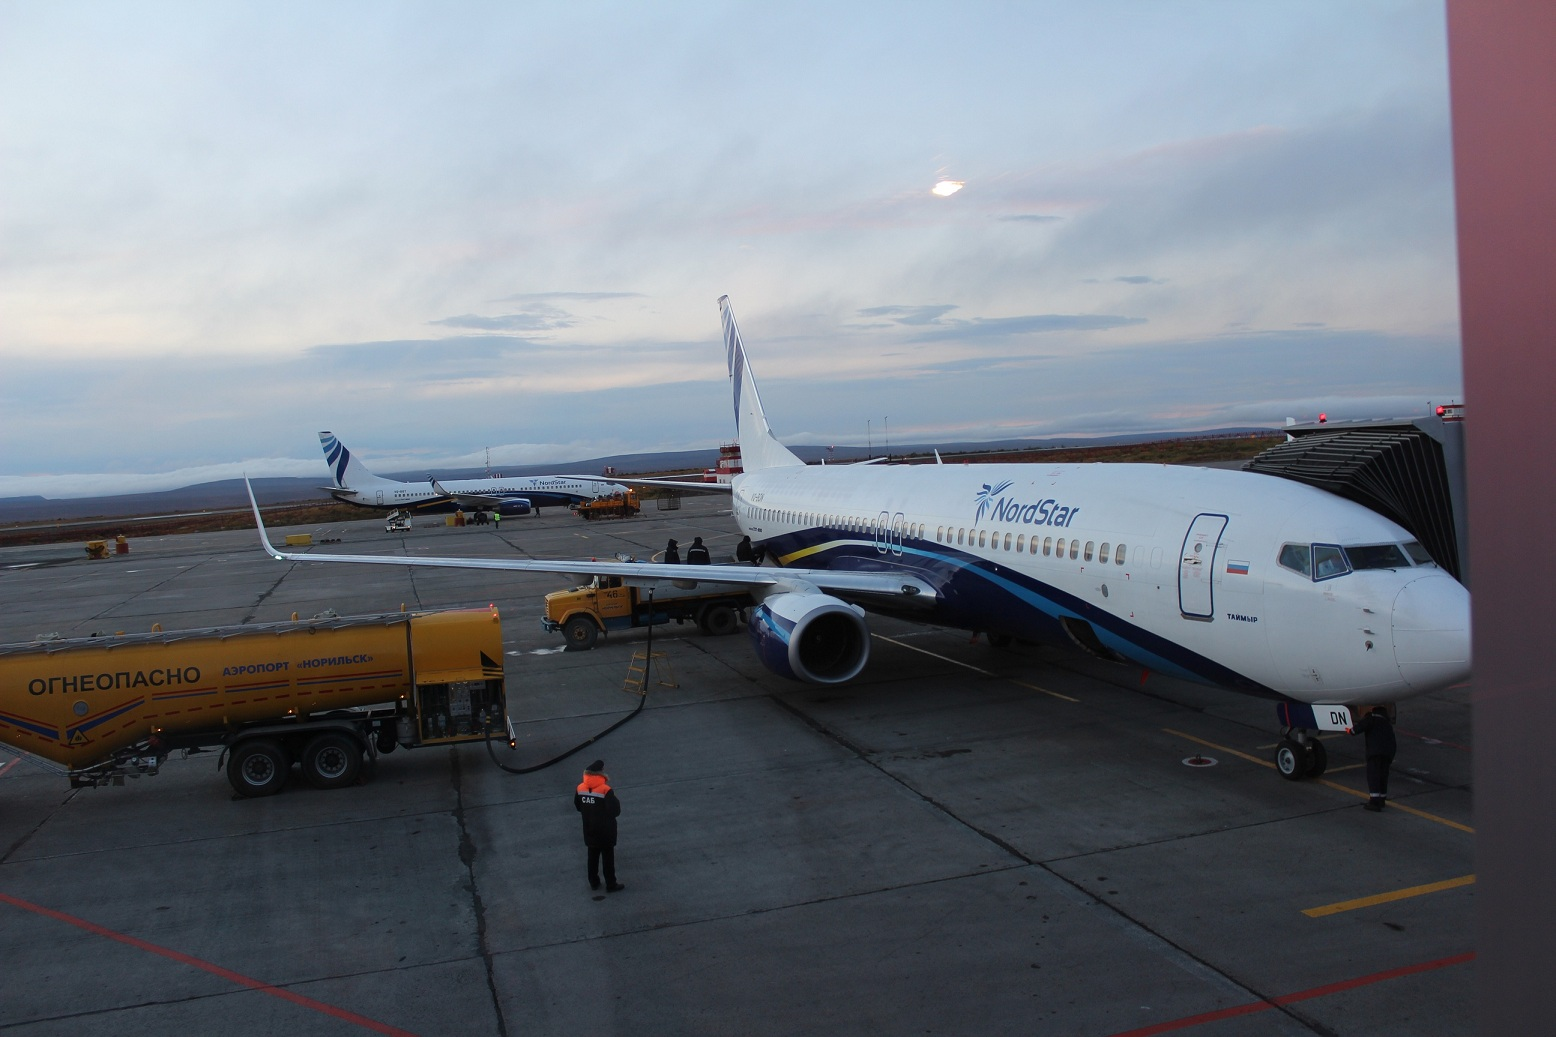 Боинг-737-800 авиакомпании NordStar в аэропорту Норильска